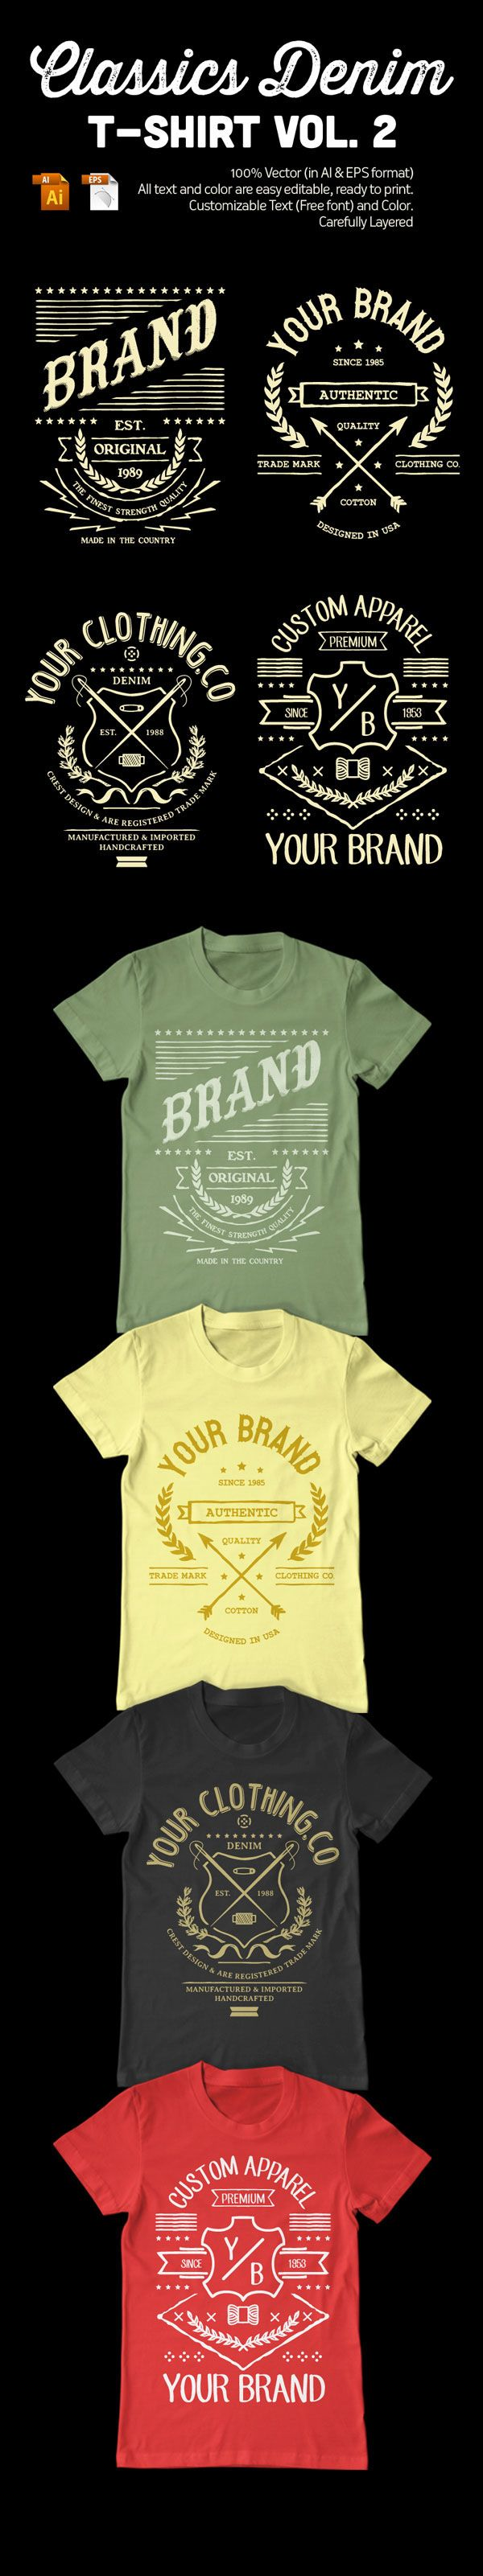 Vintage T-Shirt Design Template on Behance